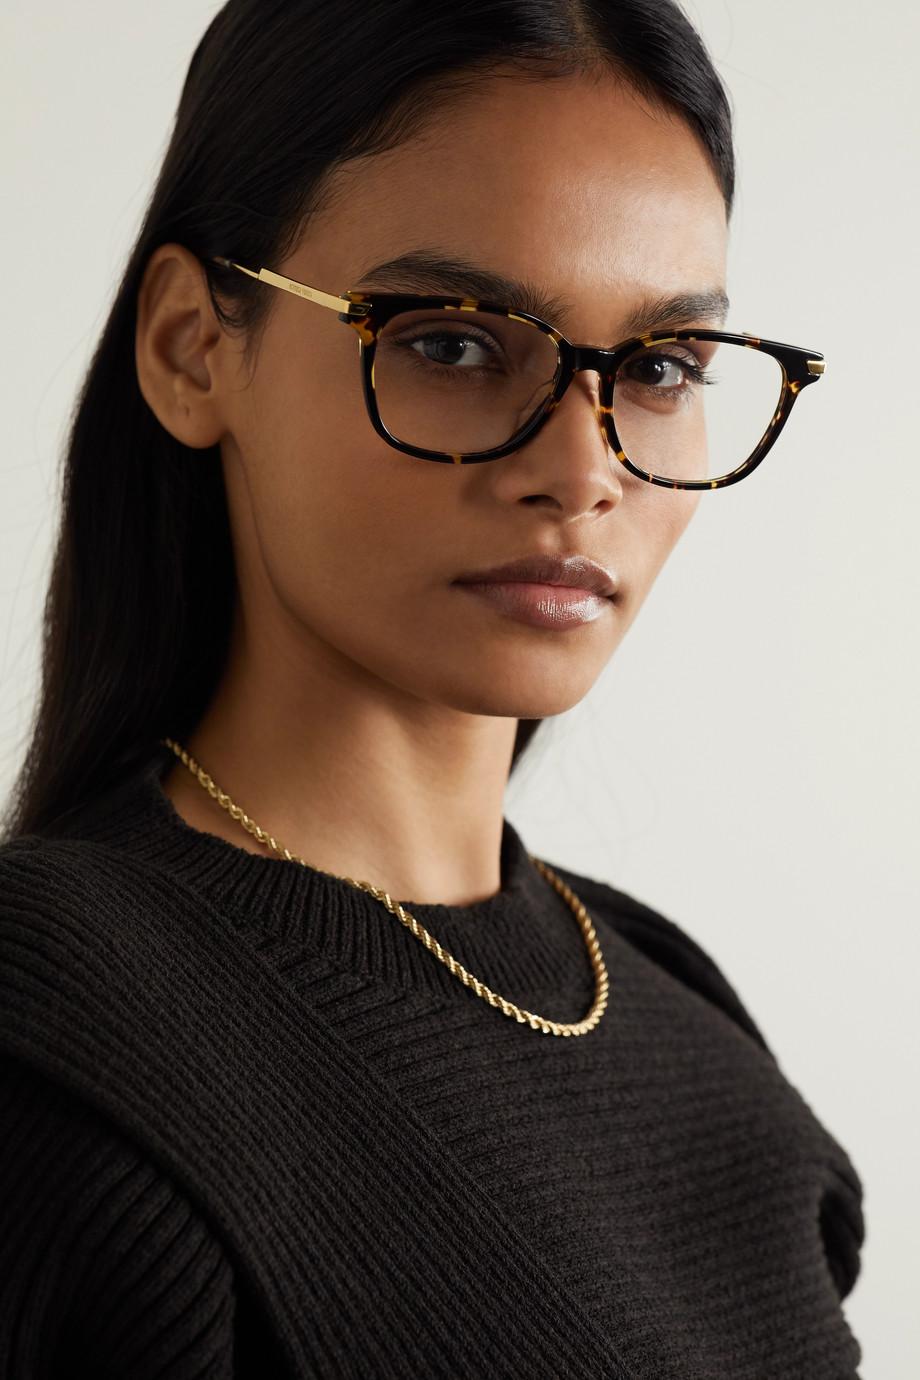 Bottega Veneta Brille mit eckigem Rahmen aus Azetat in Hornoptik mit goldfarbenen Details